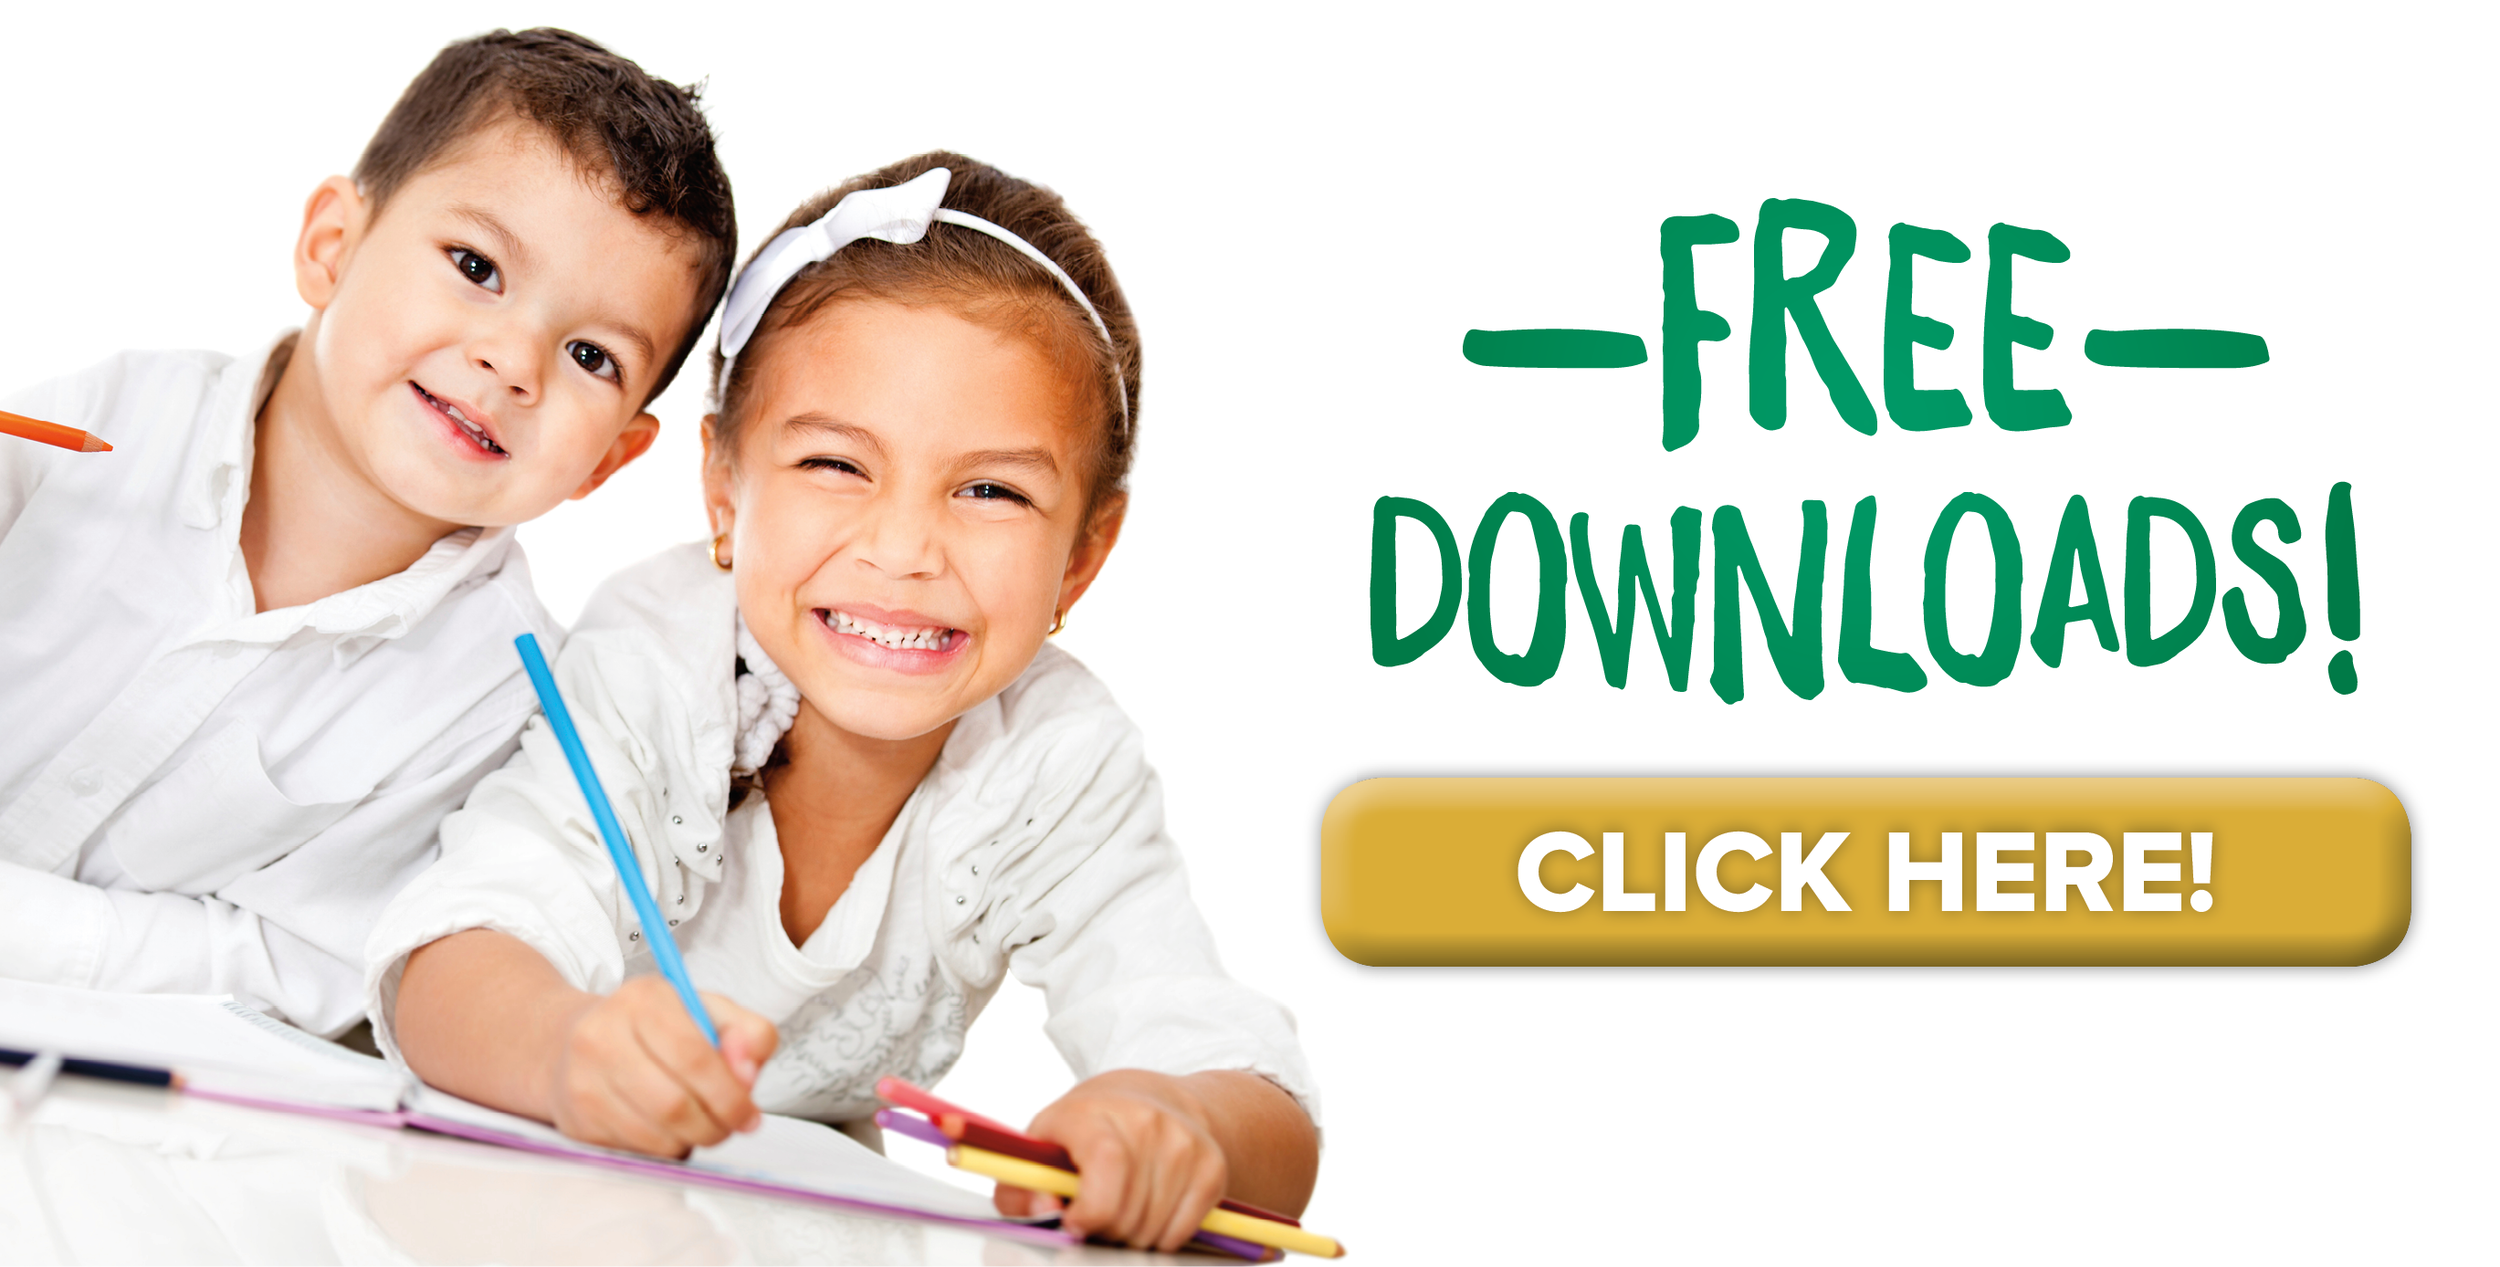 freedownloads.png